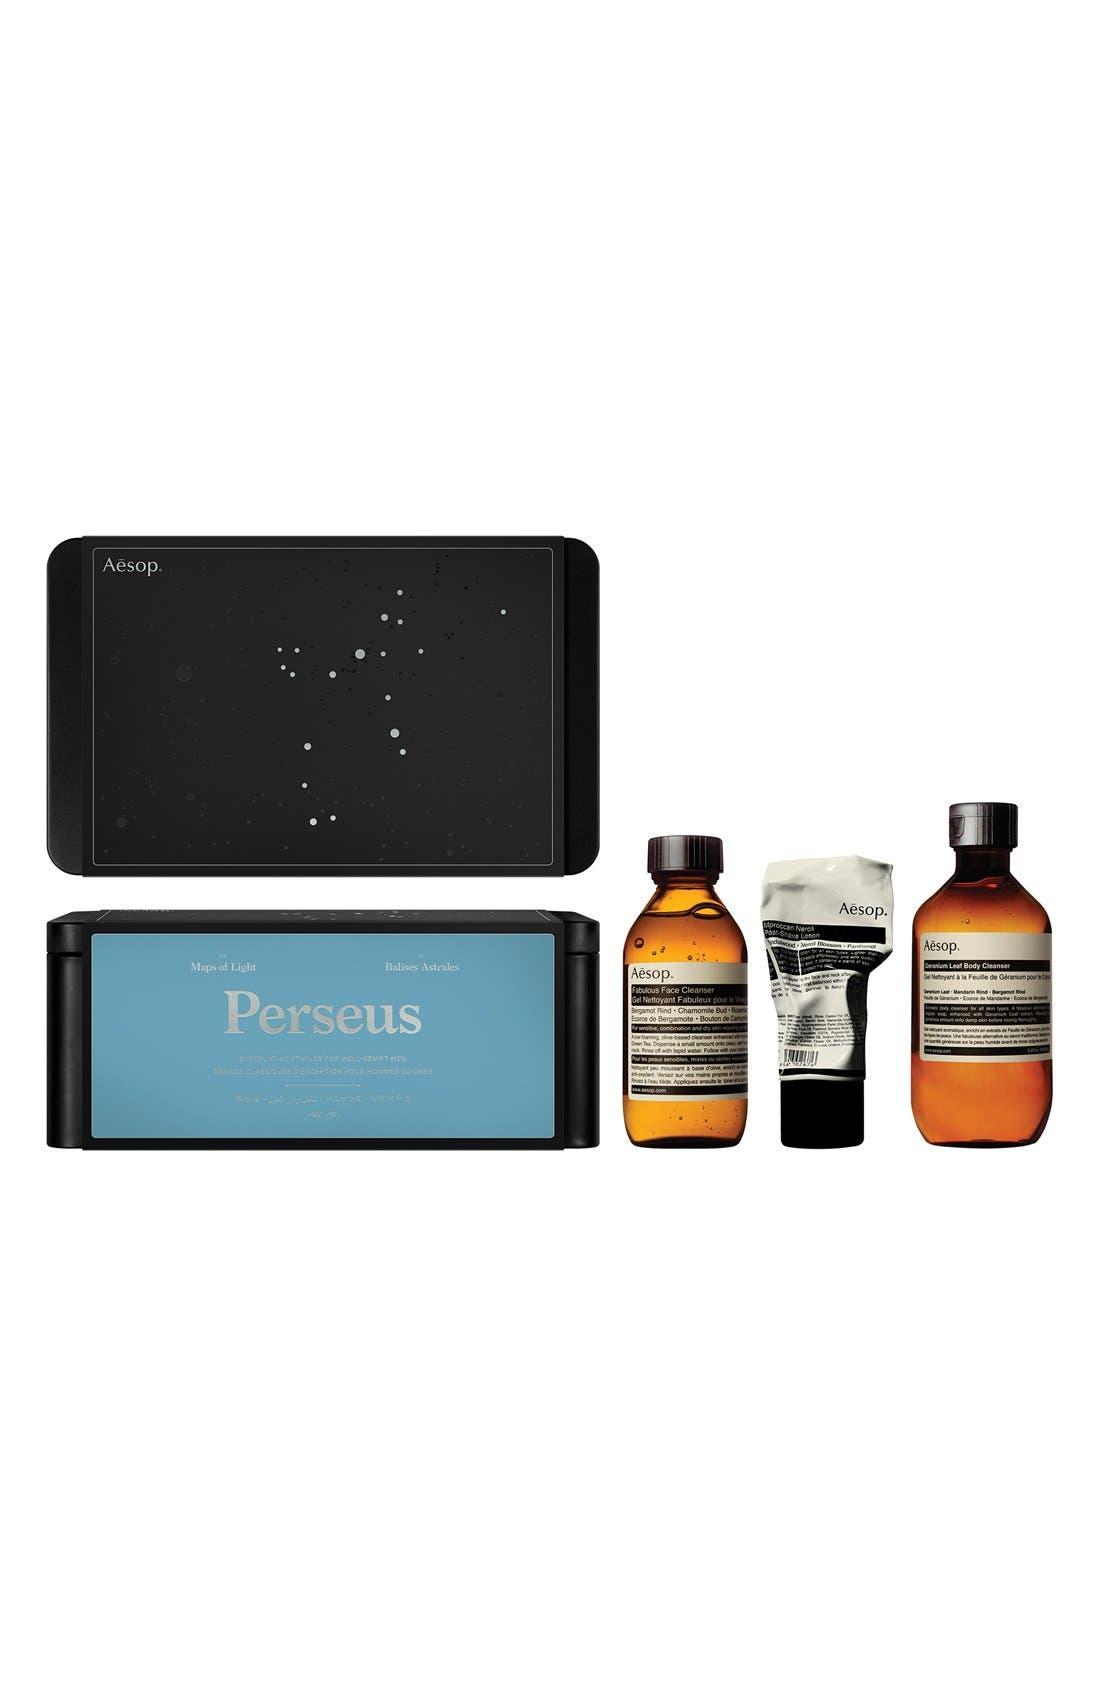 'Perseus' Grooming Kit,                             Main thumbnail 1, color,                             960